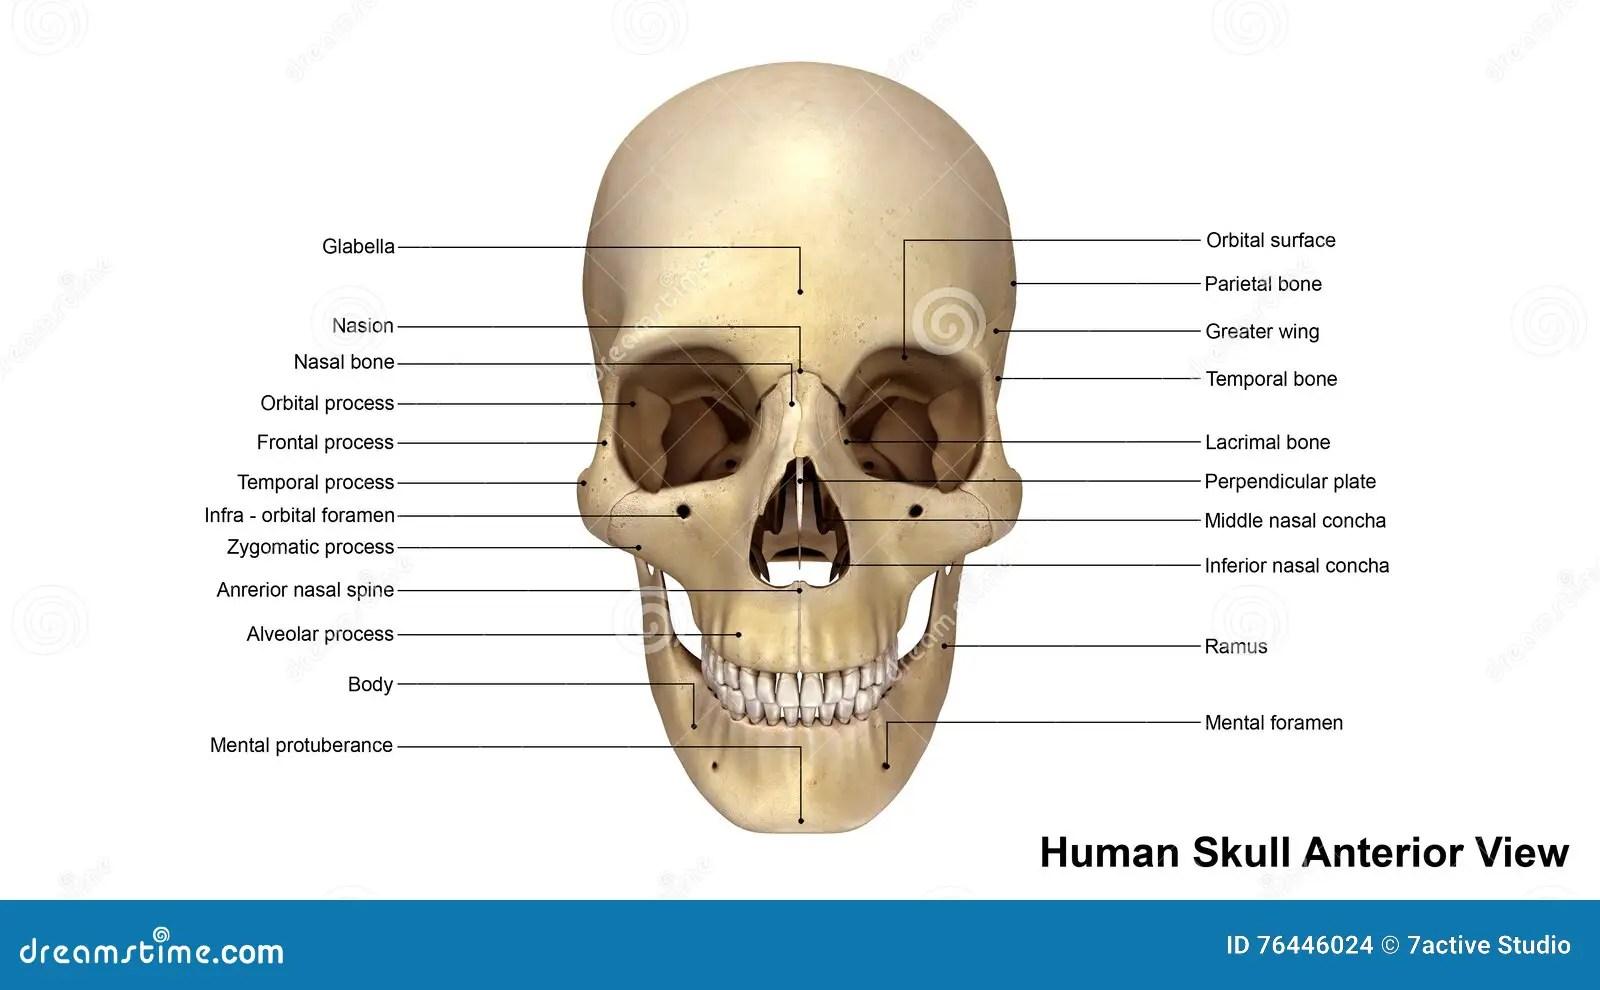 bones of the skull anterior view diagram 2000 buick lesabre wiring stock illustration. illustration - 76446024